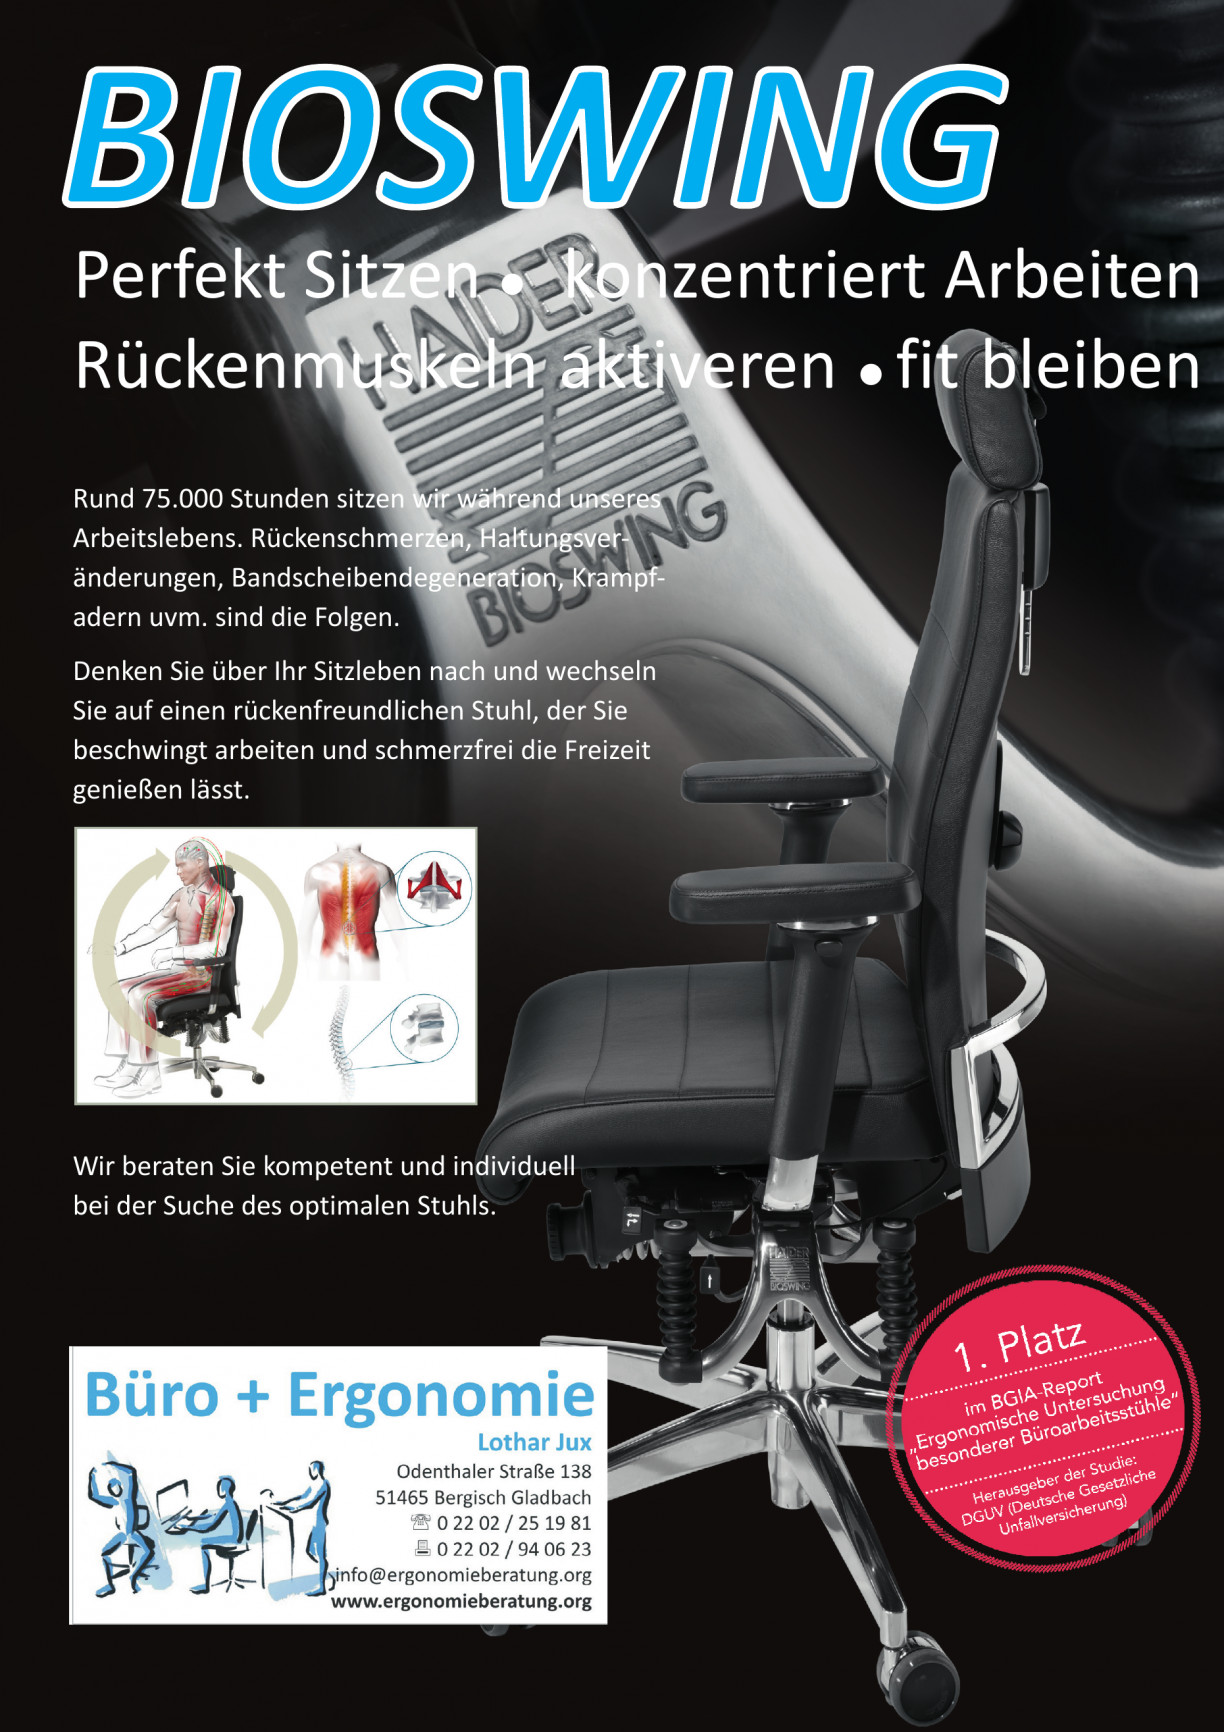 Ergonomieberatung Lothar Jux